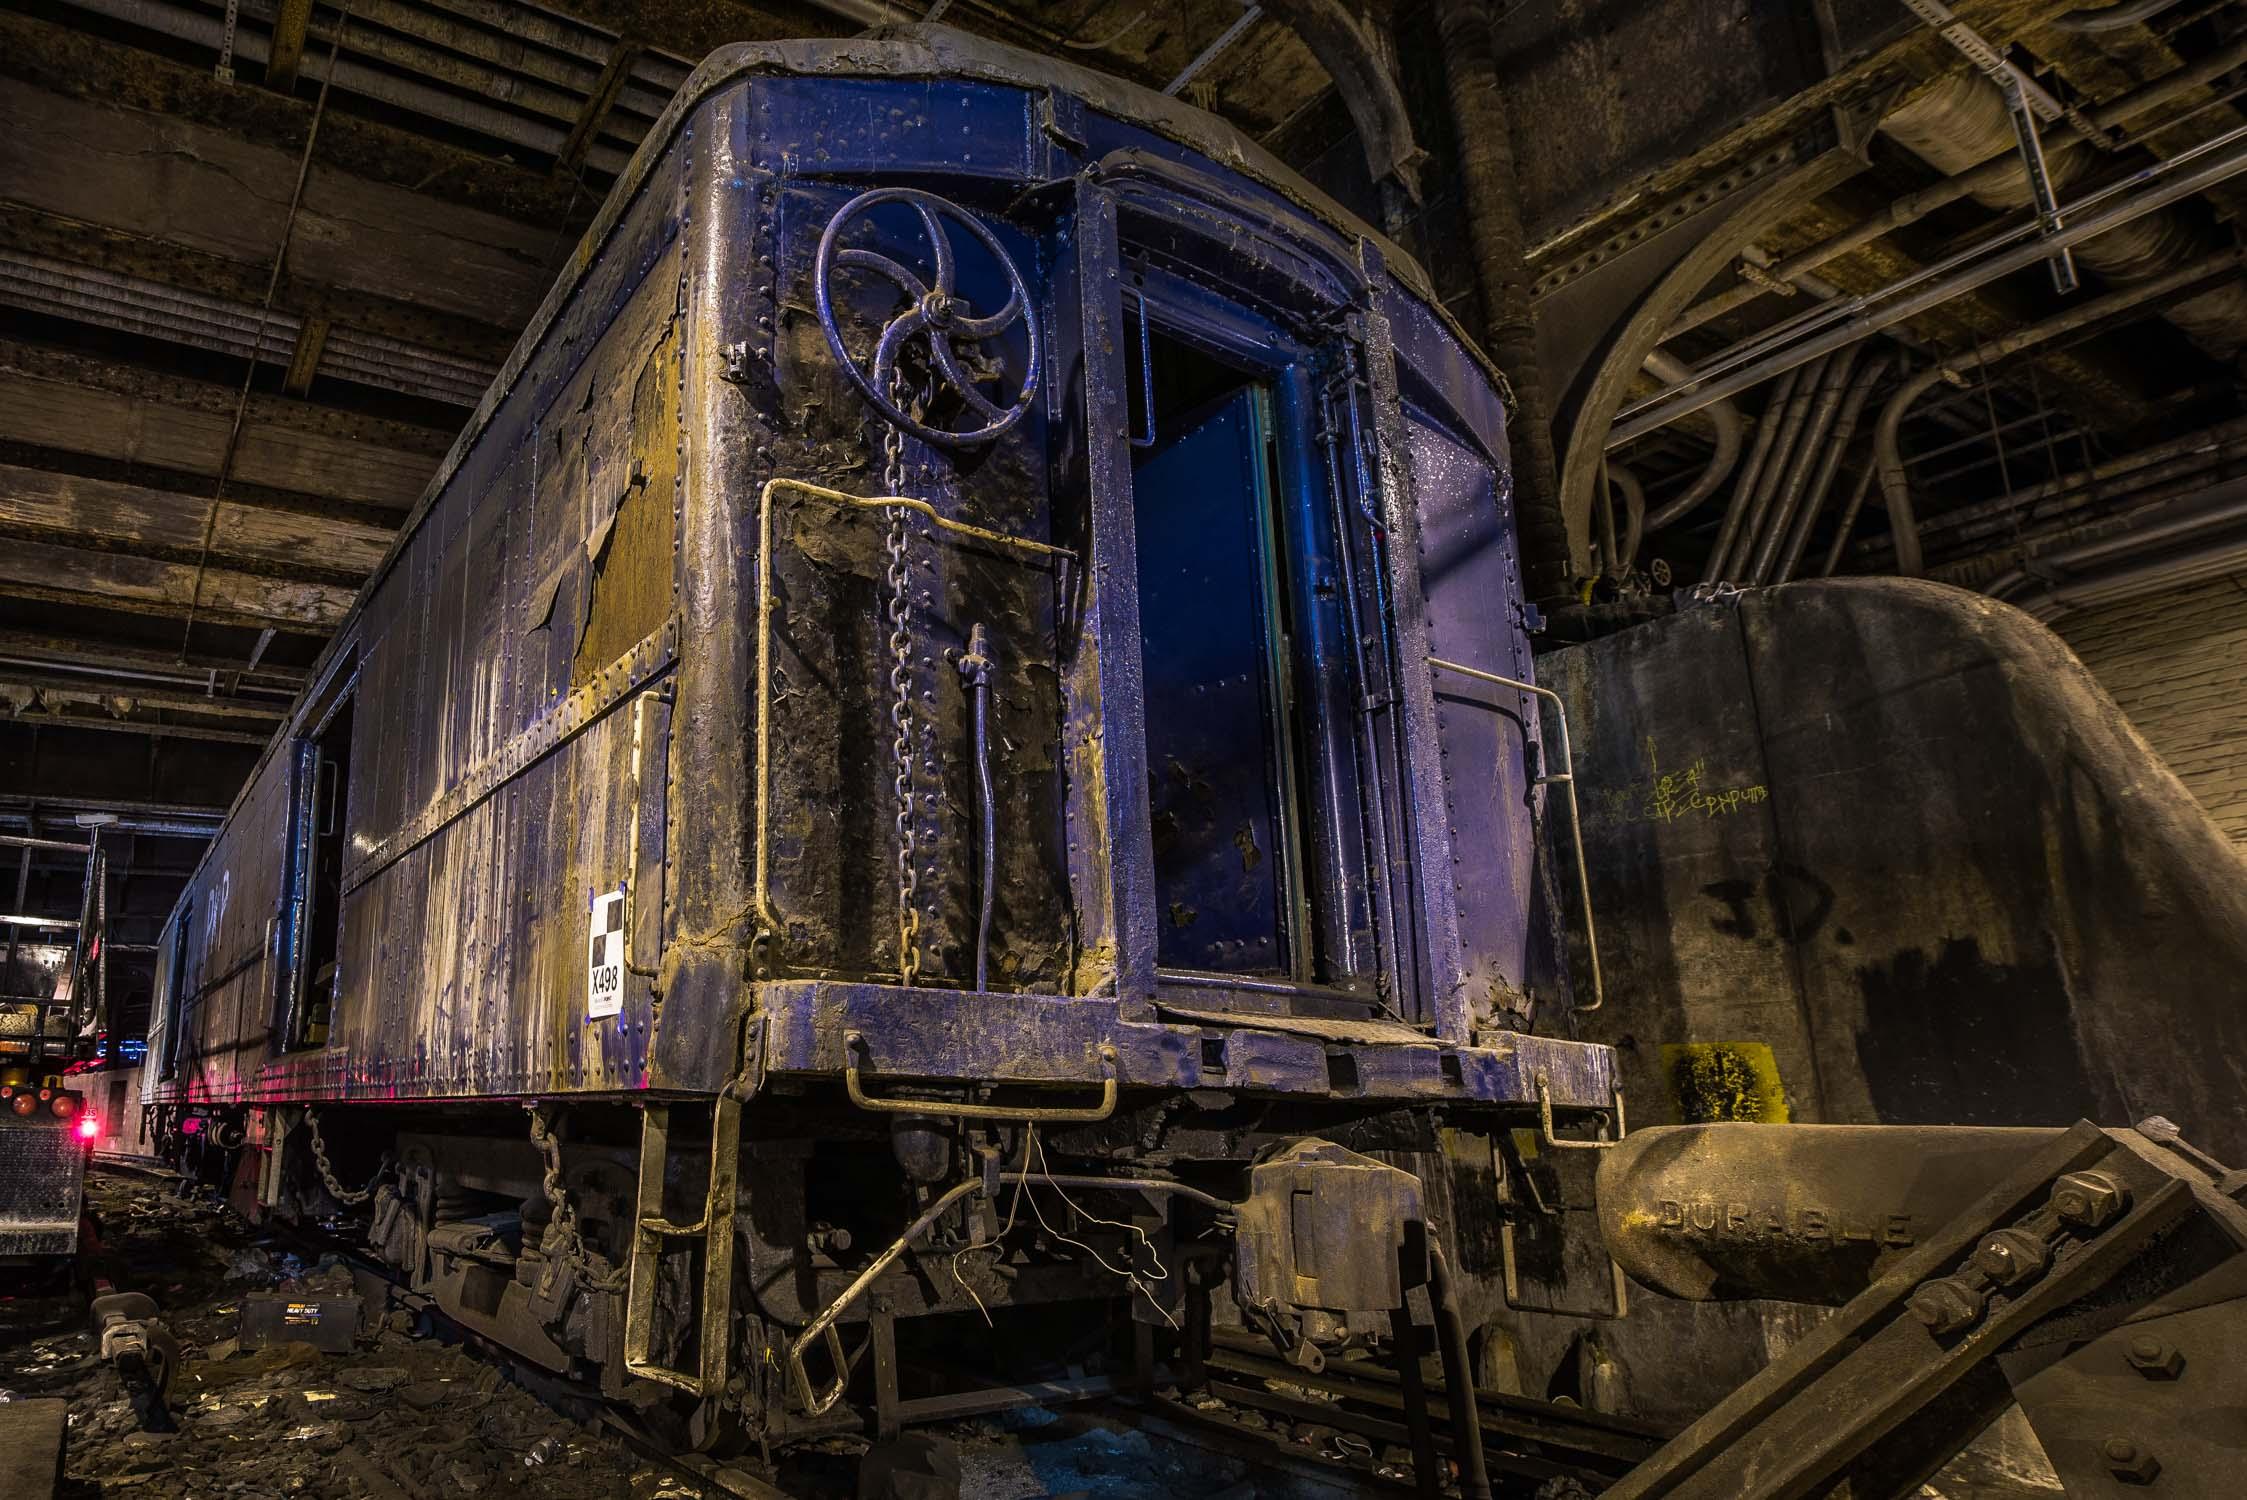 Abandoned Track 61 under the Waldorf Astoria